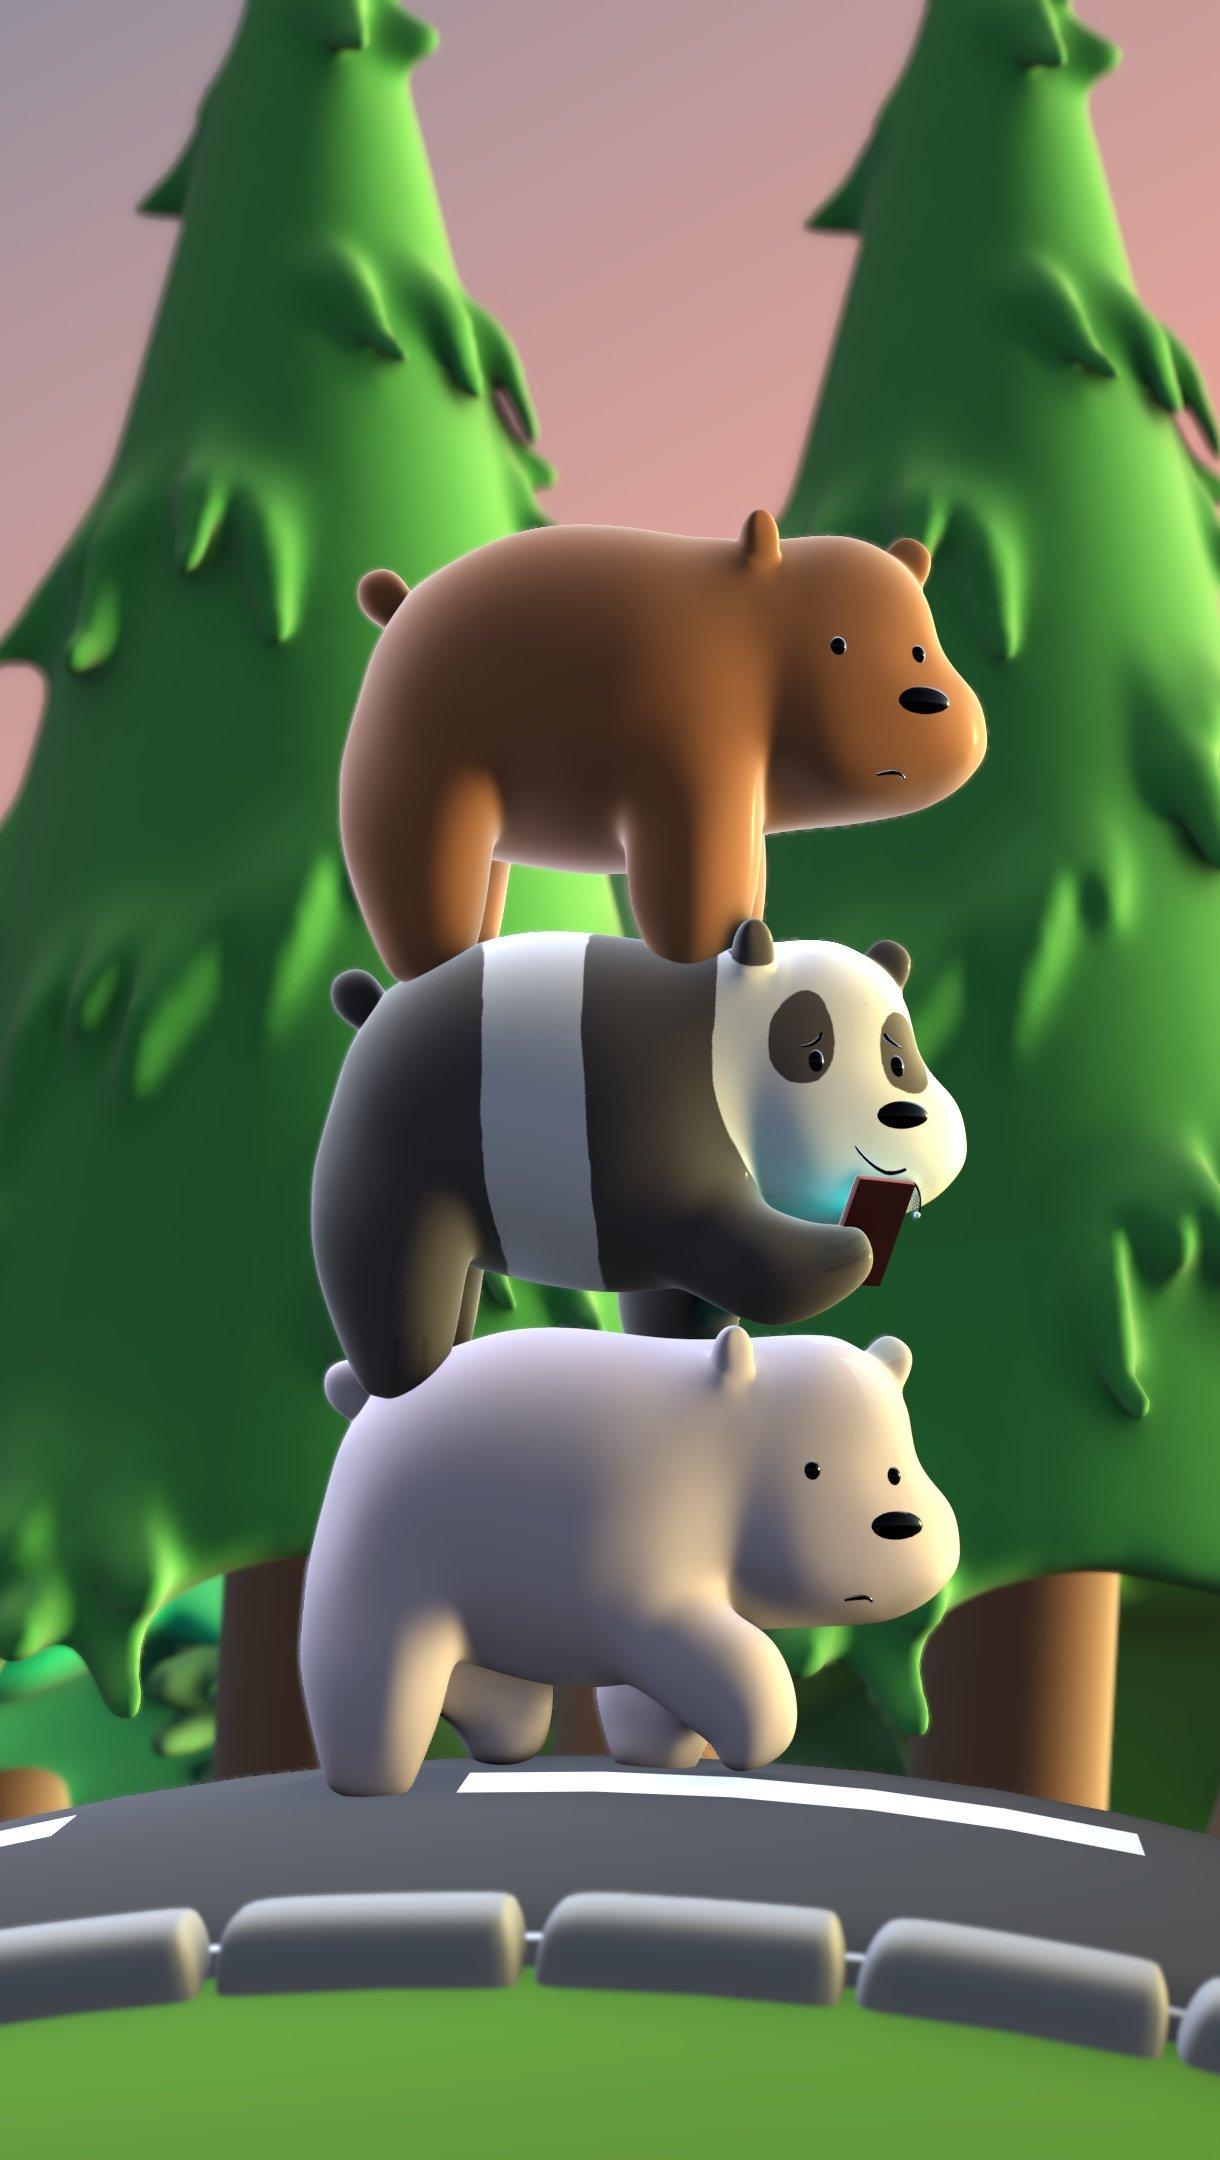 Wallpaper 3D We Bare Bears Vertical